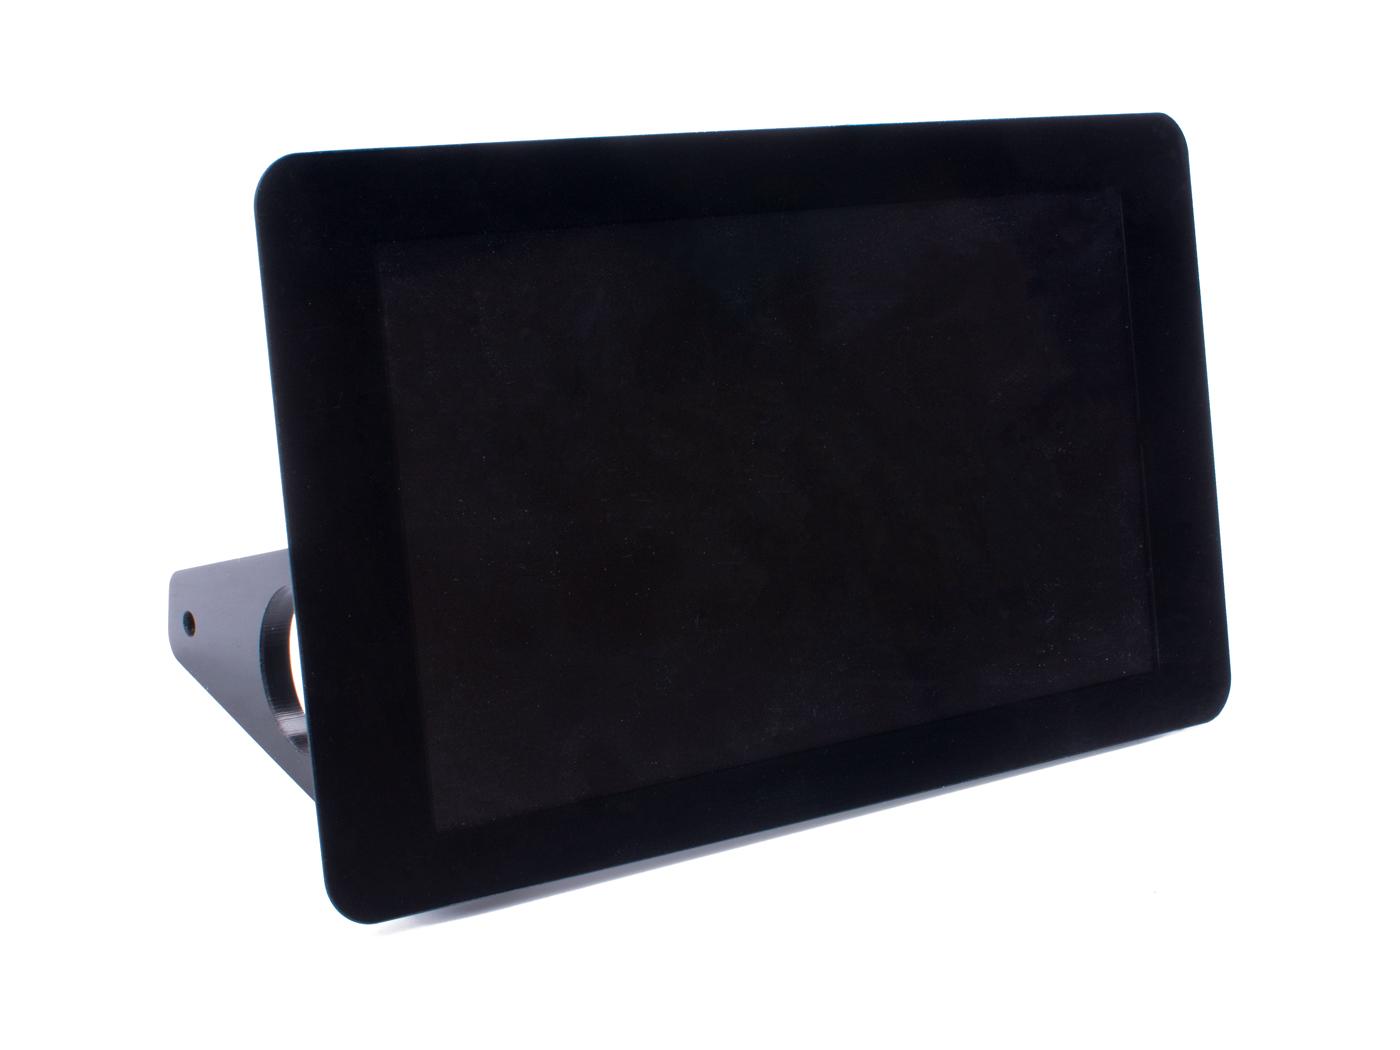 RF Explorer - Raspberry Pi Touch screen Holder Assemble